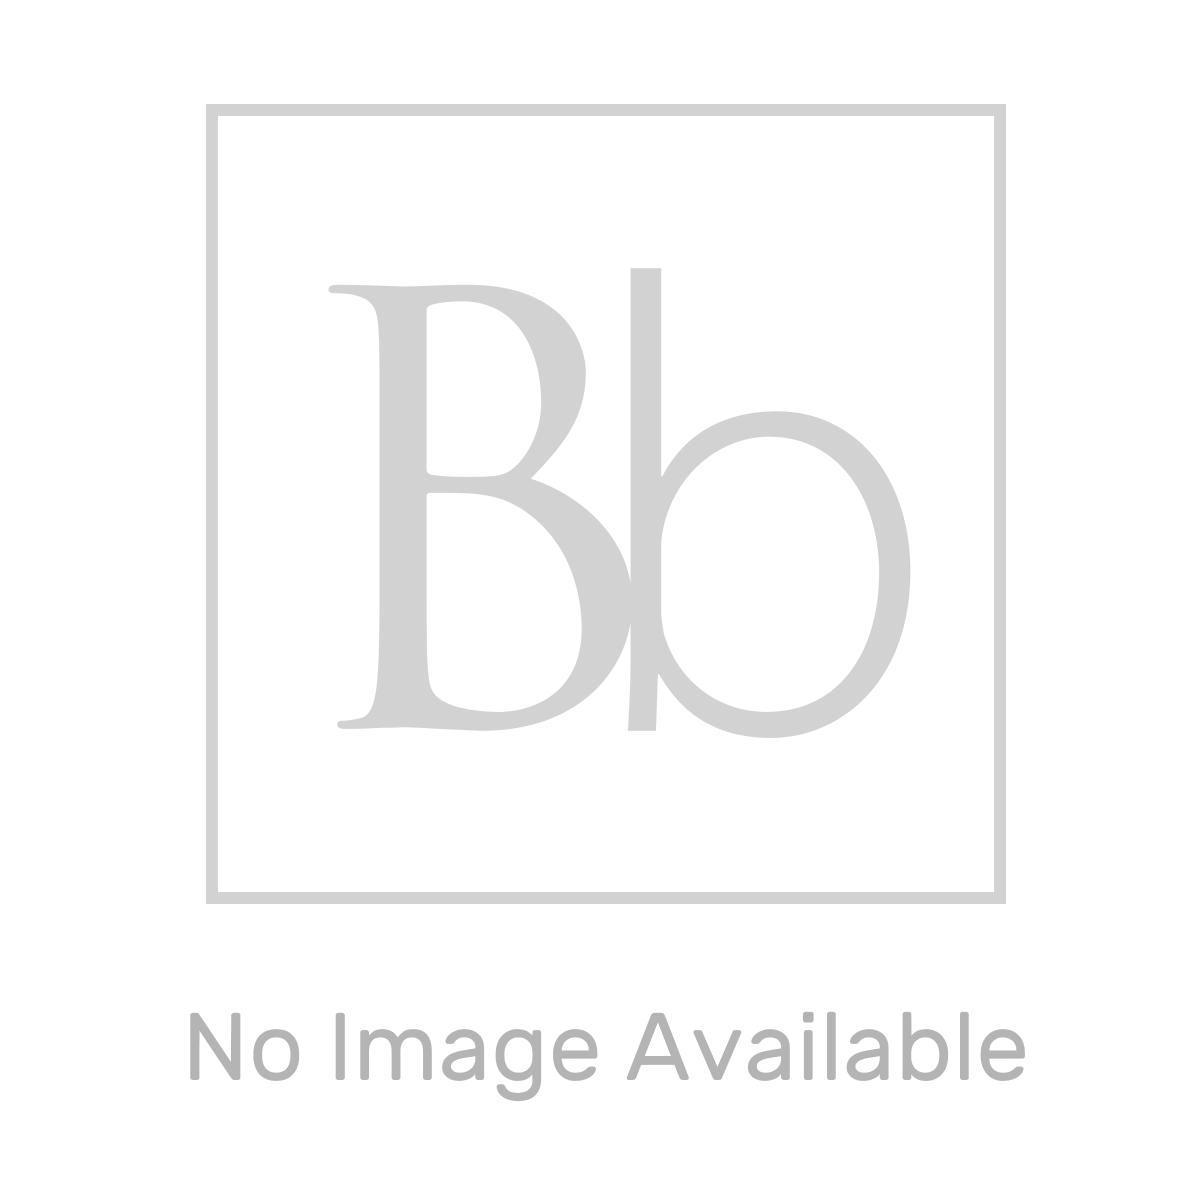 Aquadart White Slate Shower Tray 1500 x 760 Lifestyle